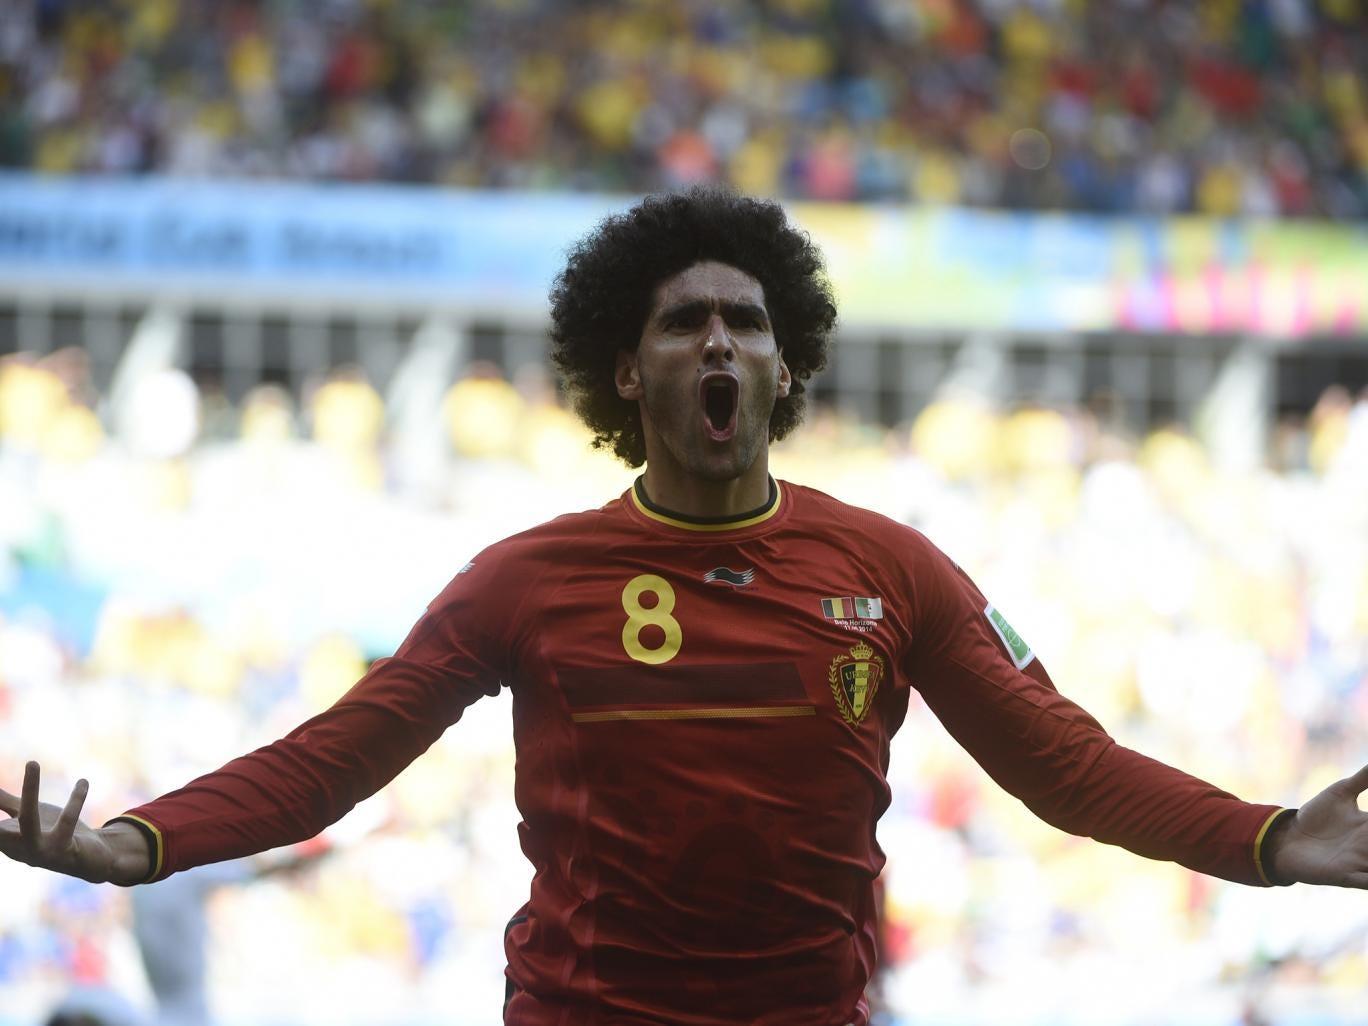 Marouane Fellaini celebrates bringing the scores level